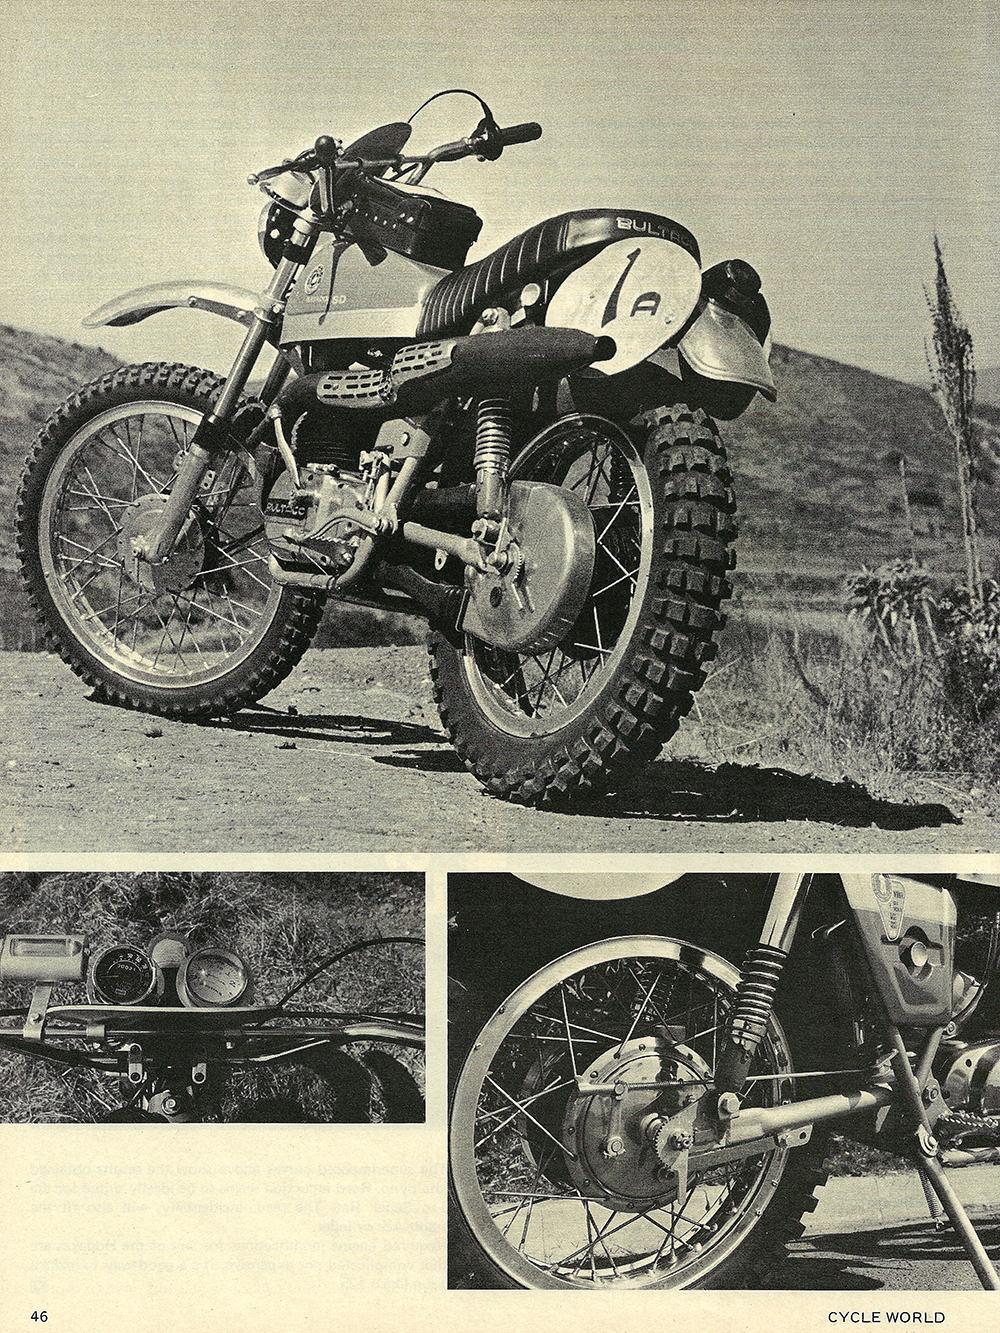 1972 Bultaco Matador Mark 4 SD road test 01.jpg